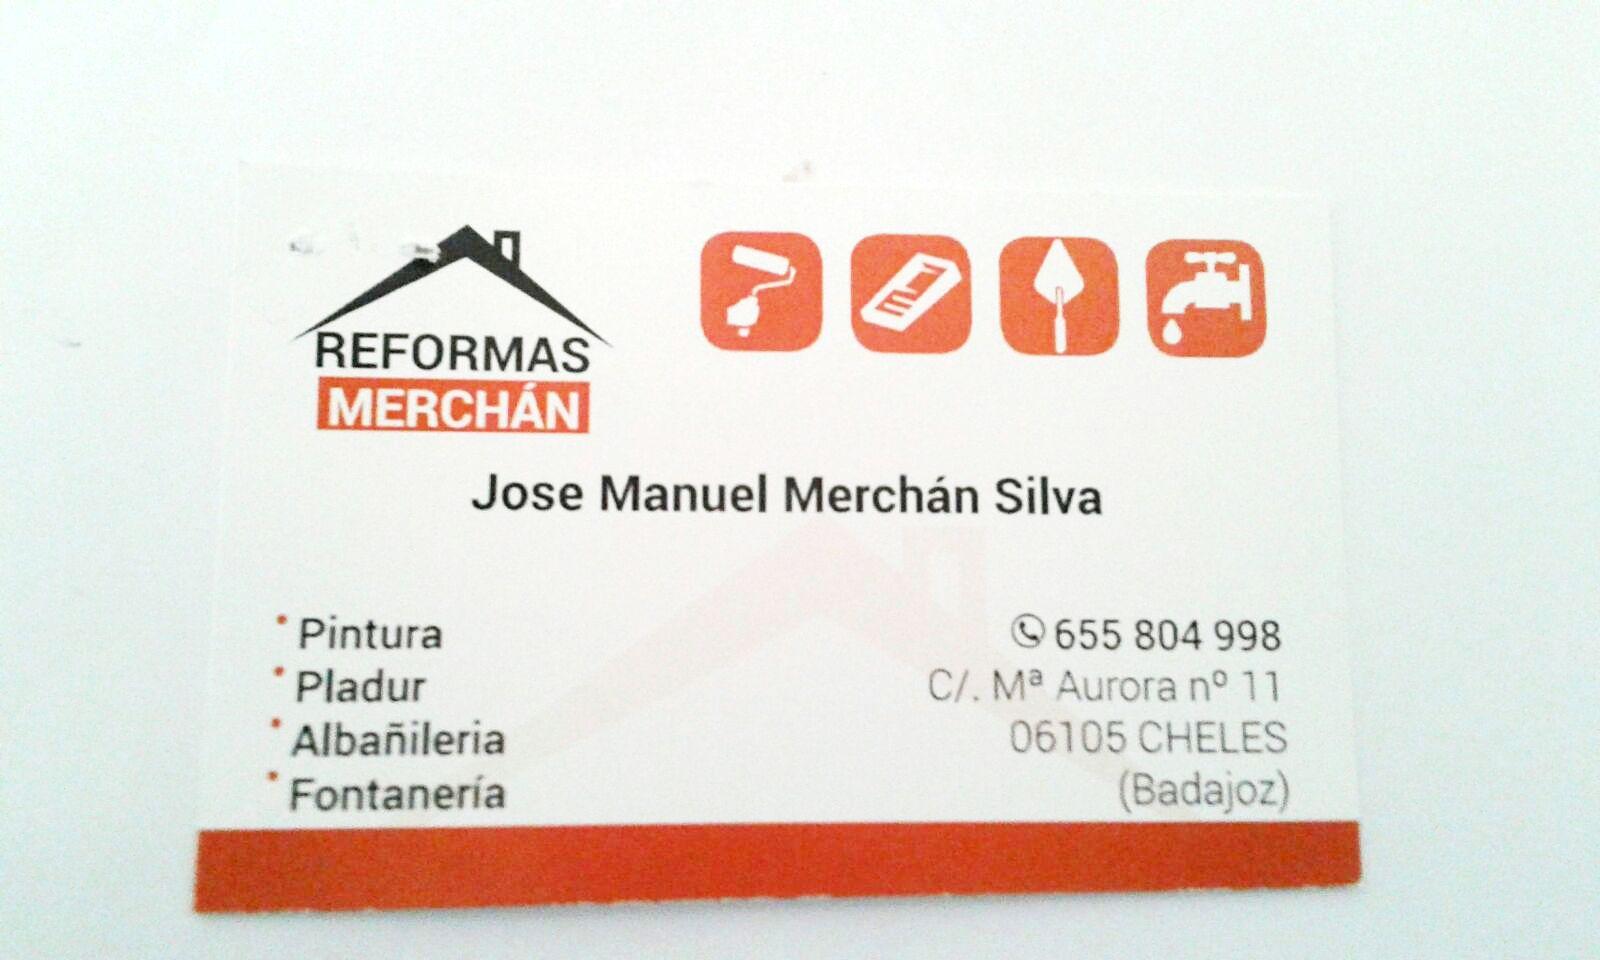 REFORMAS MERCHÁN